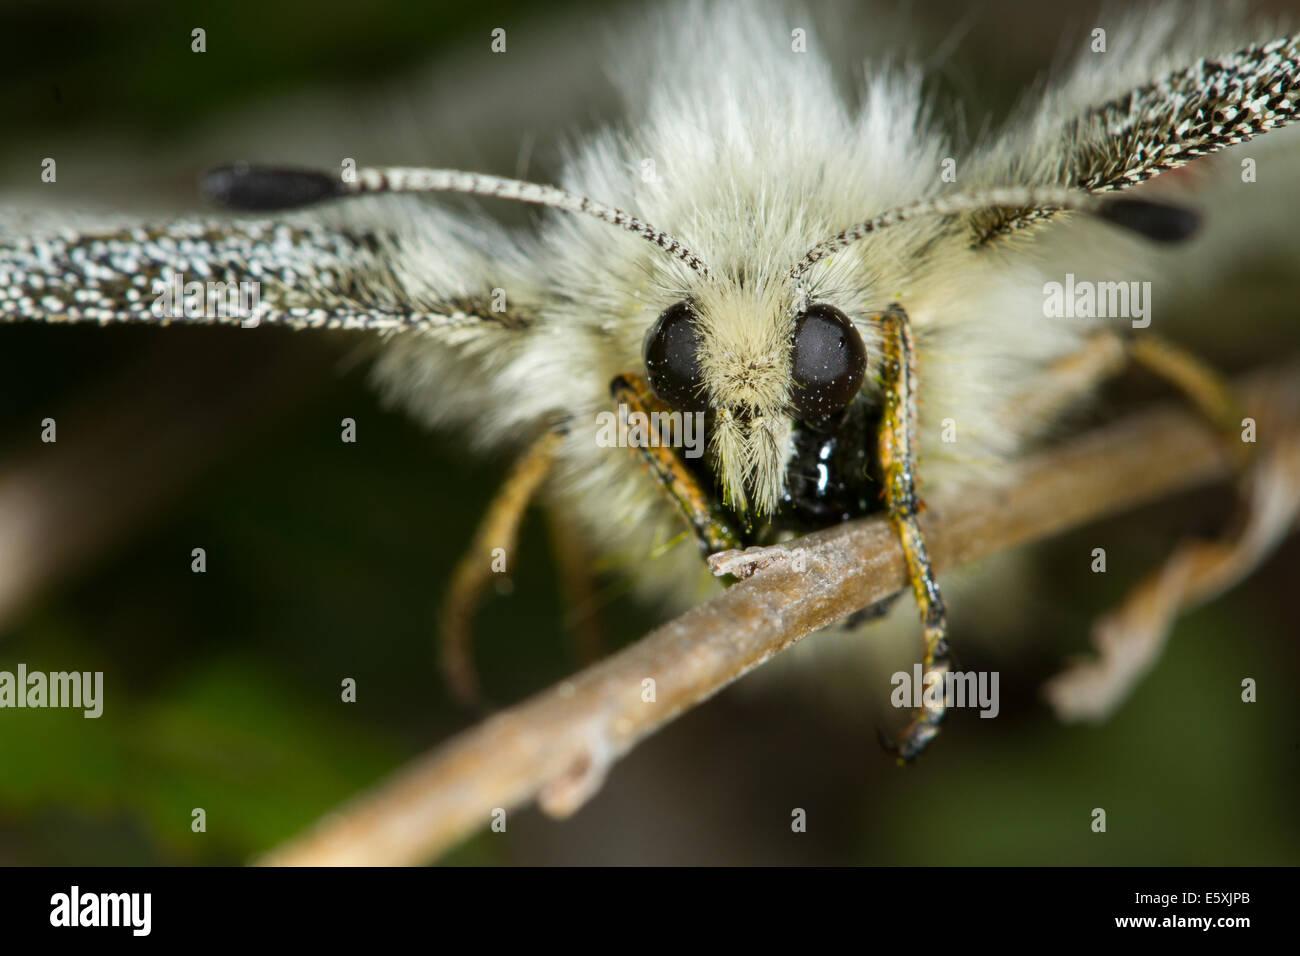 Apollo (Parnassius apollo) butterfly - Stock Image